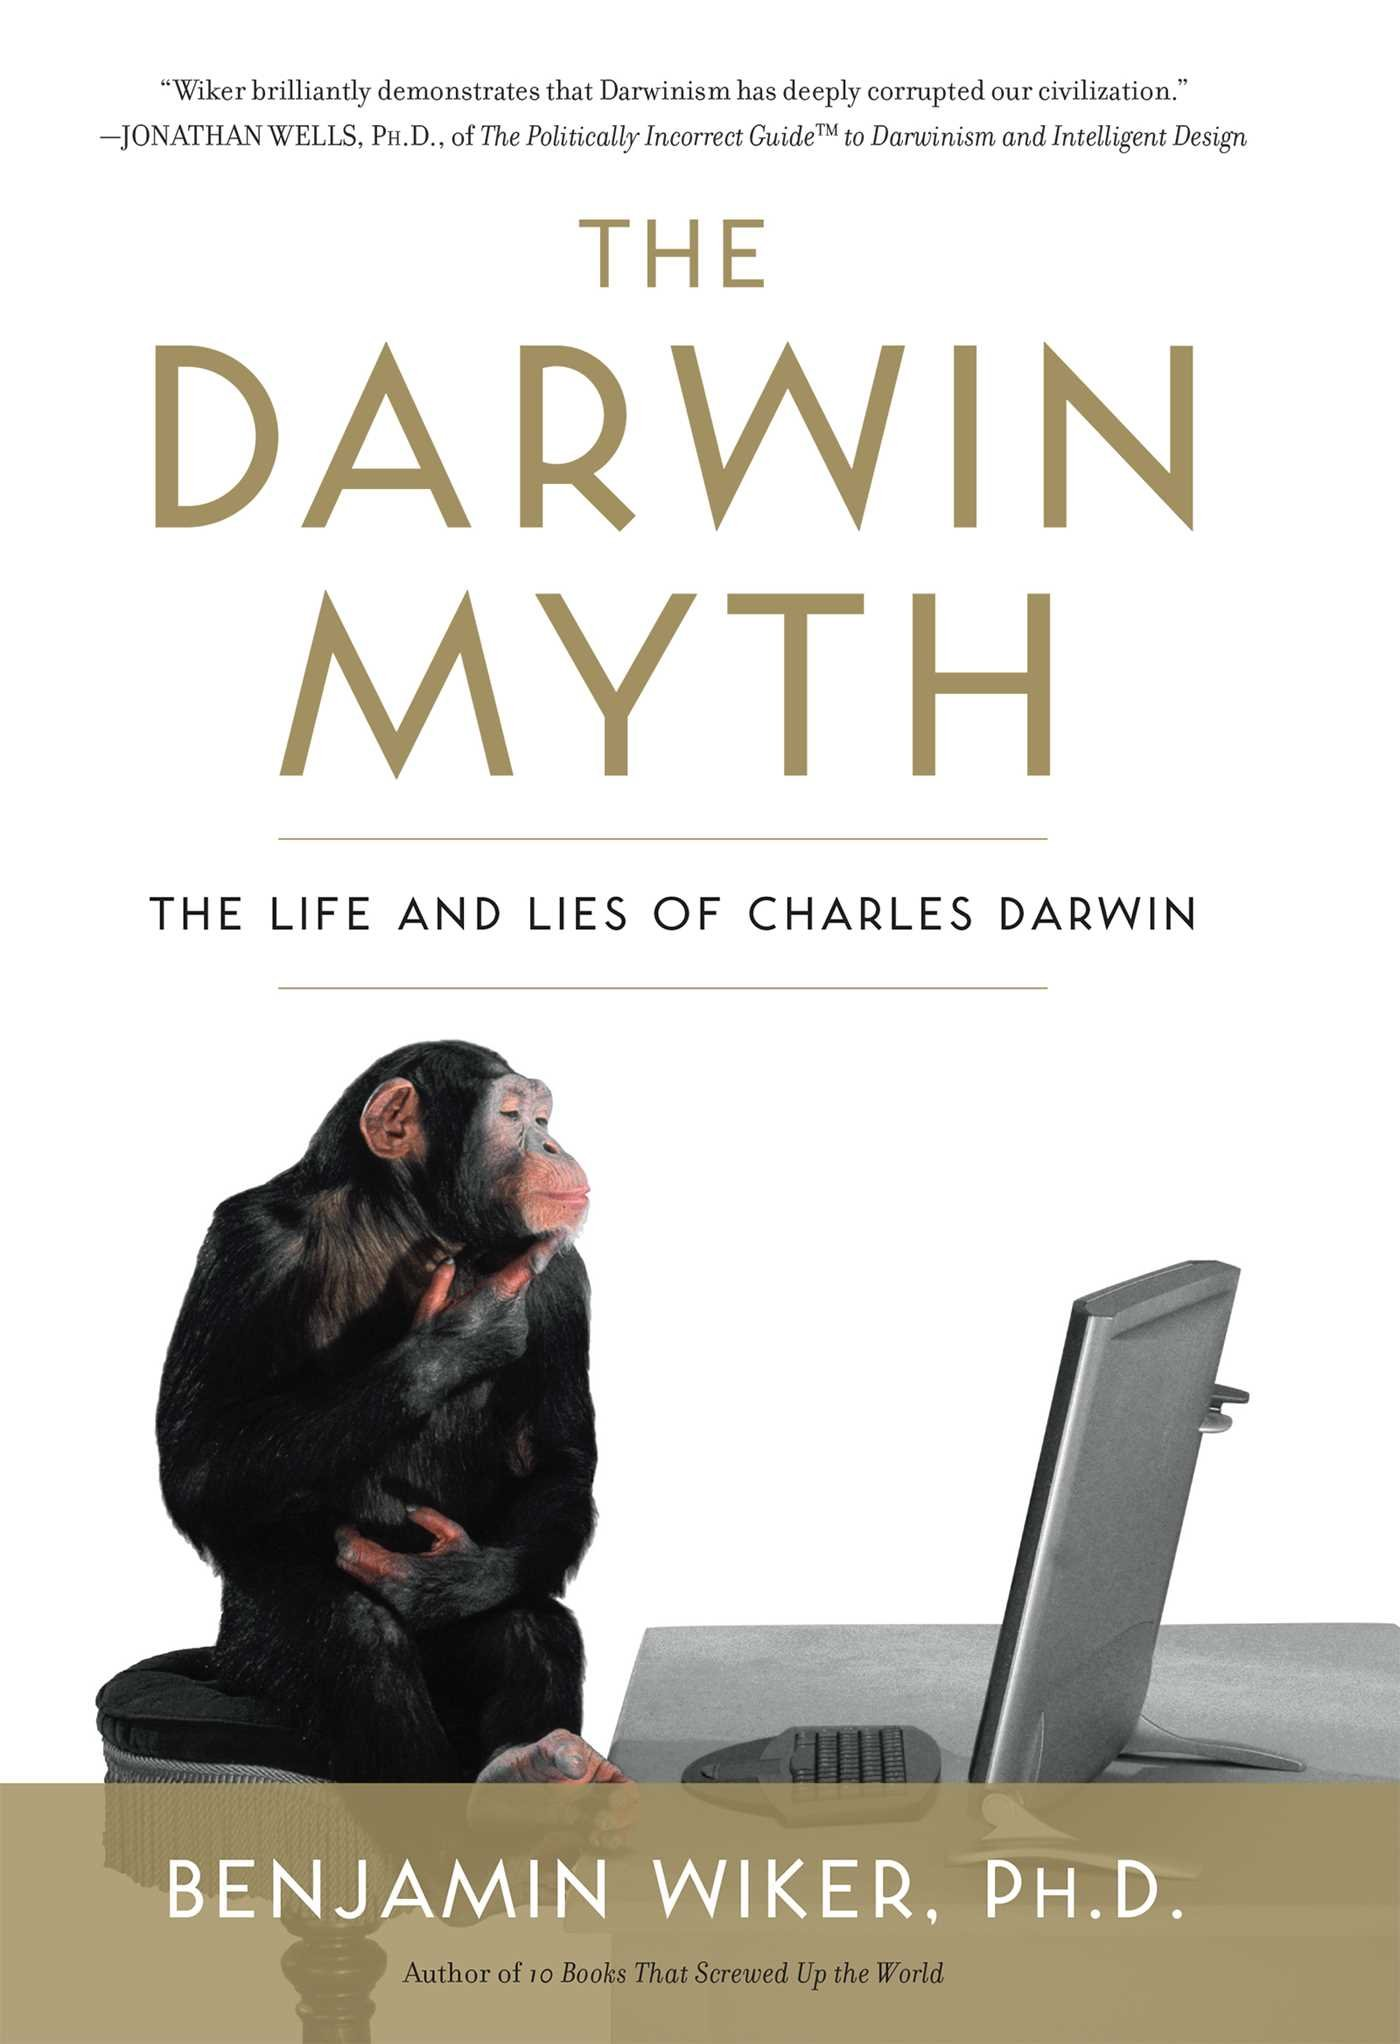 The Darwin Myth: The Life and Lies of Charles Darwin